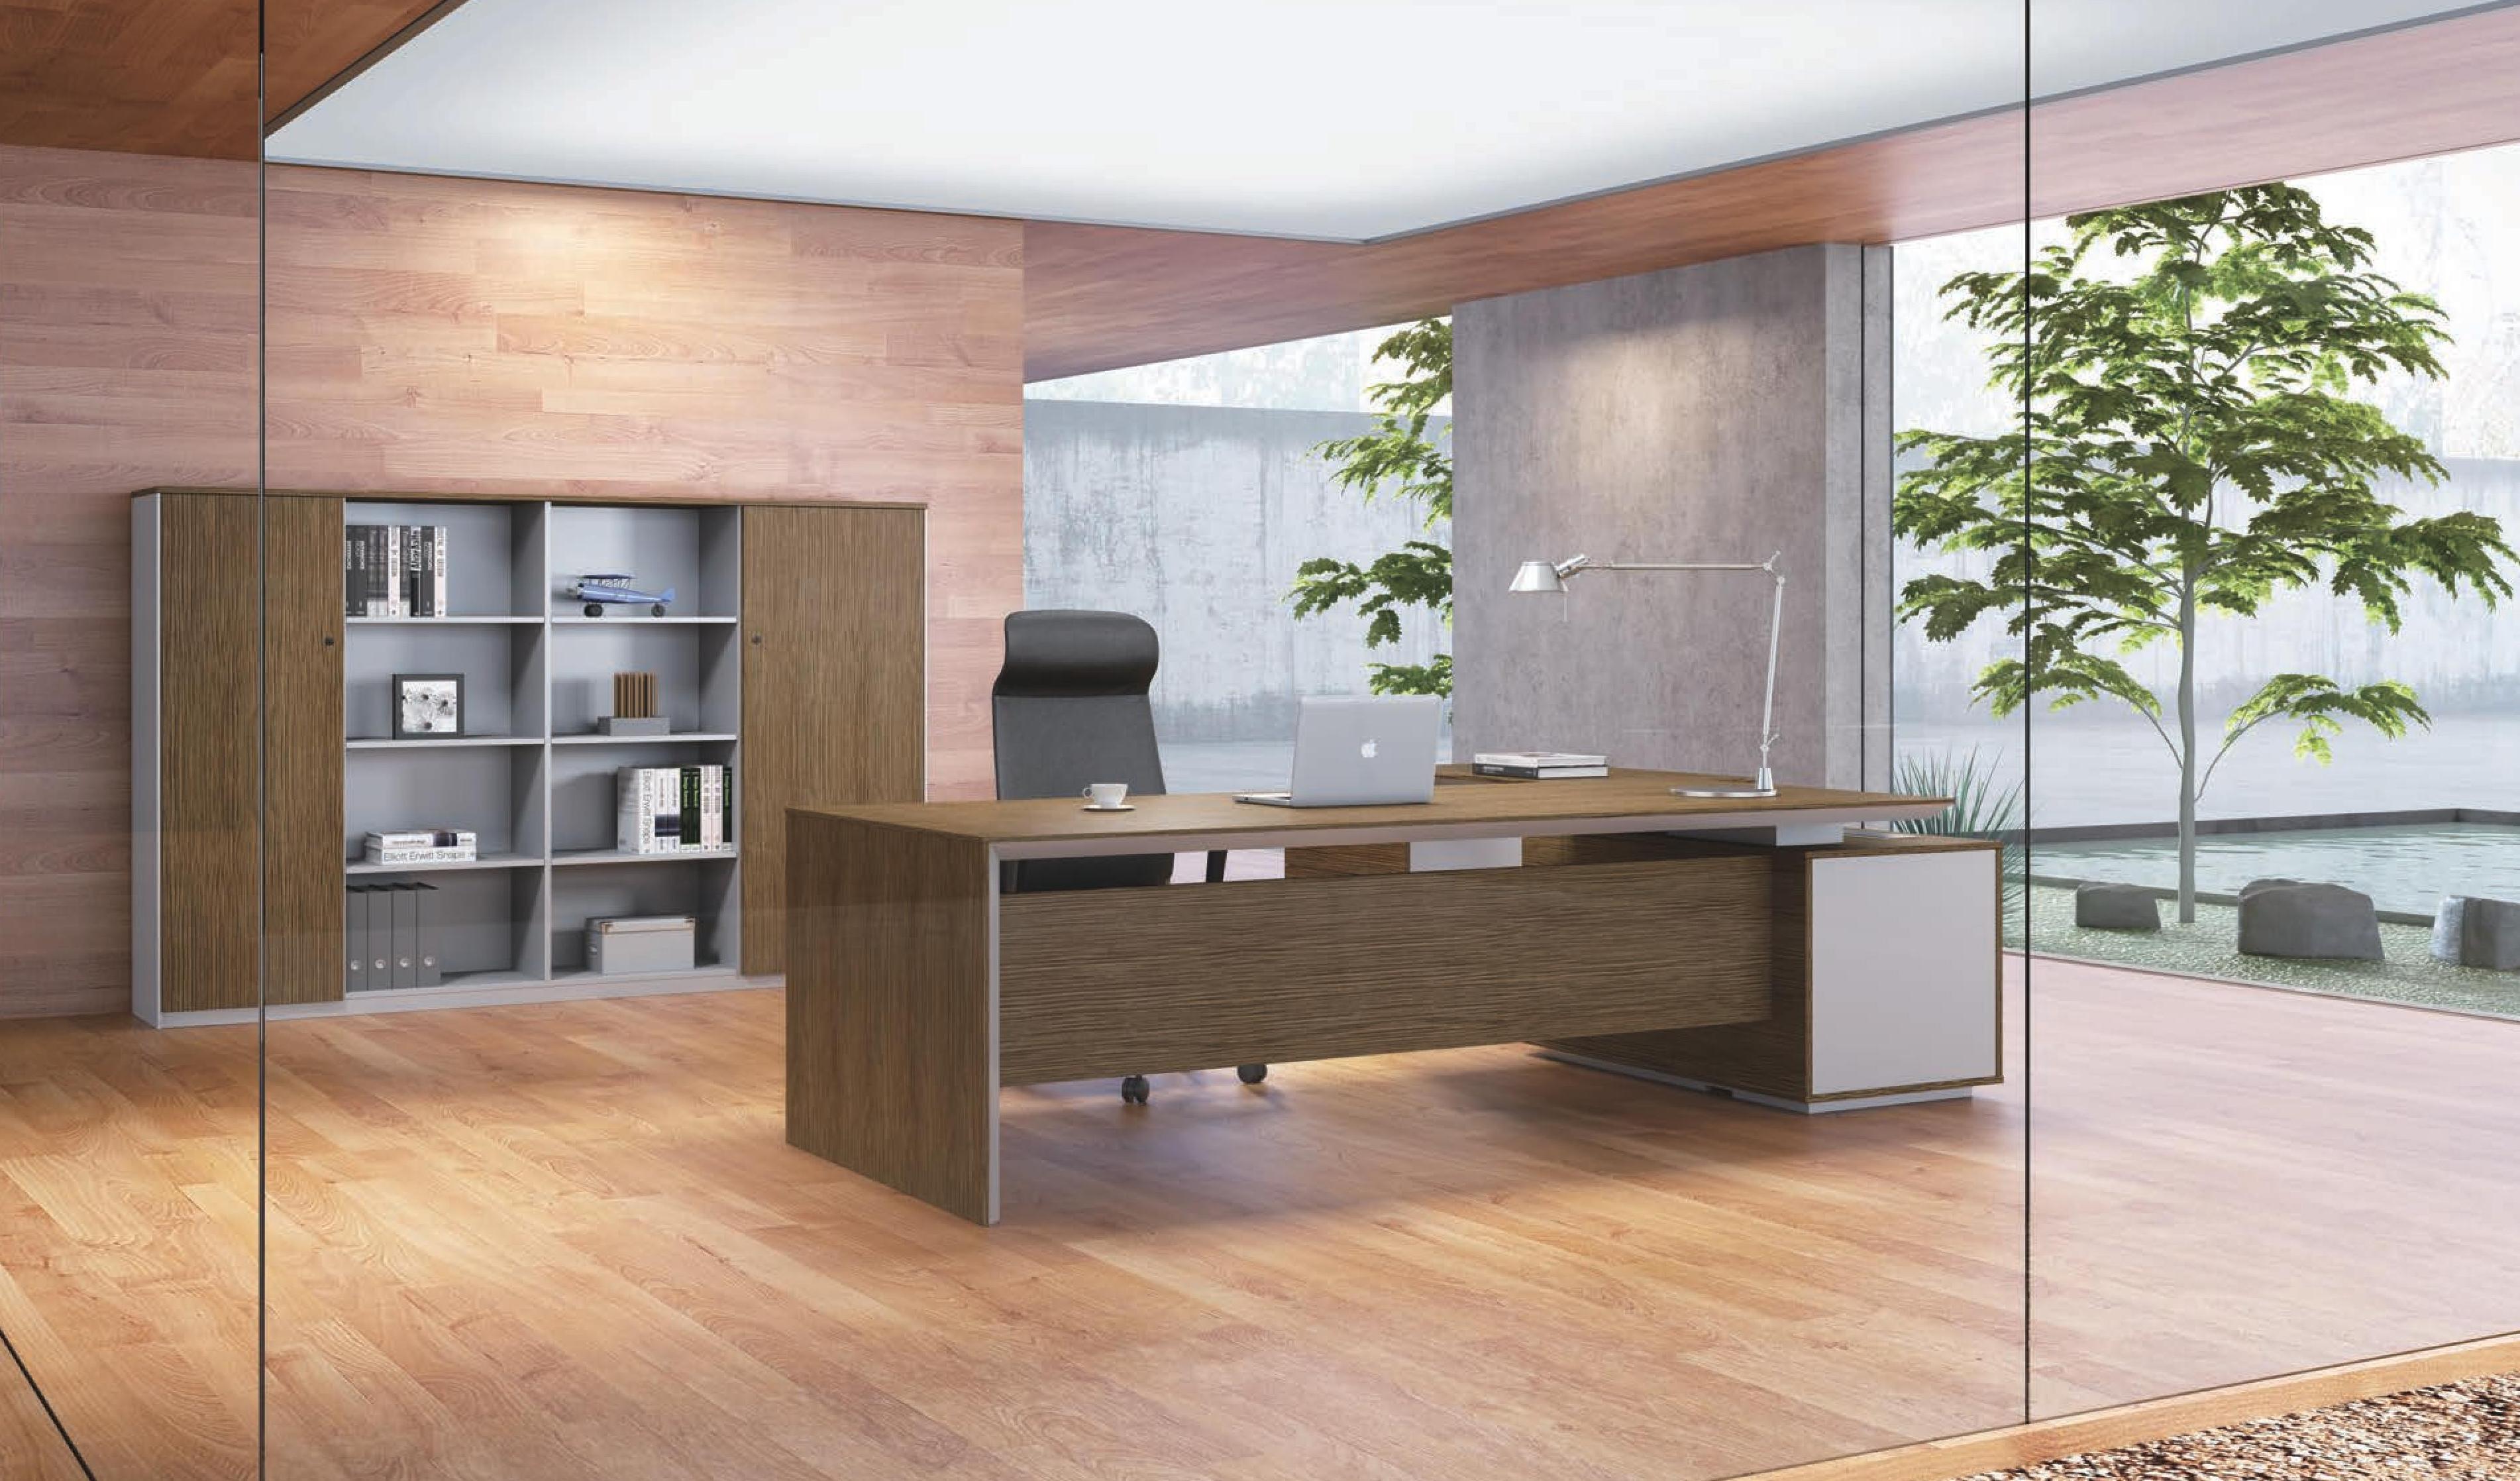 Sirius 8 Feet Office Table Boss S Cabin